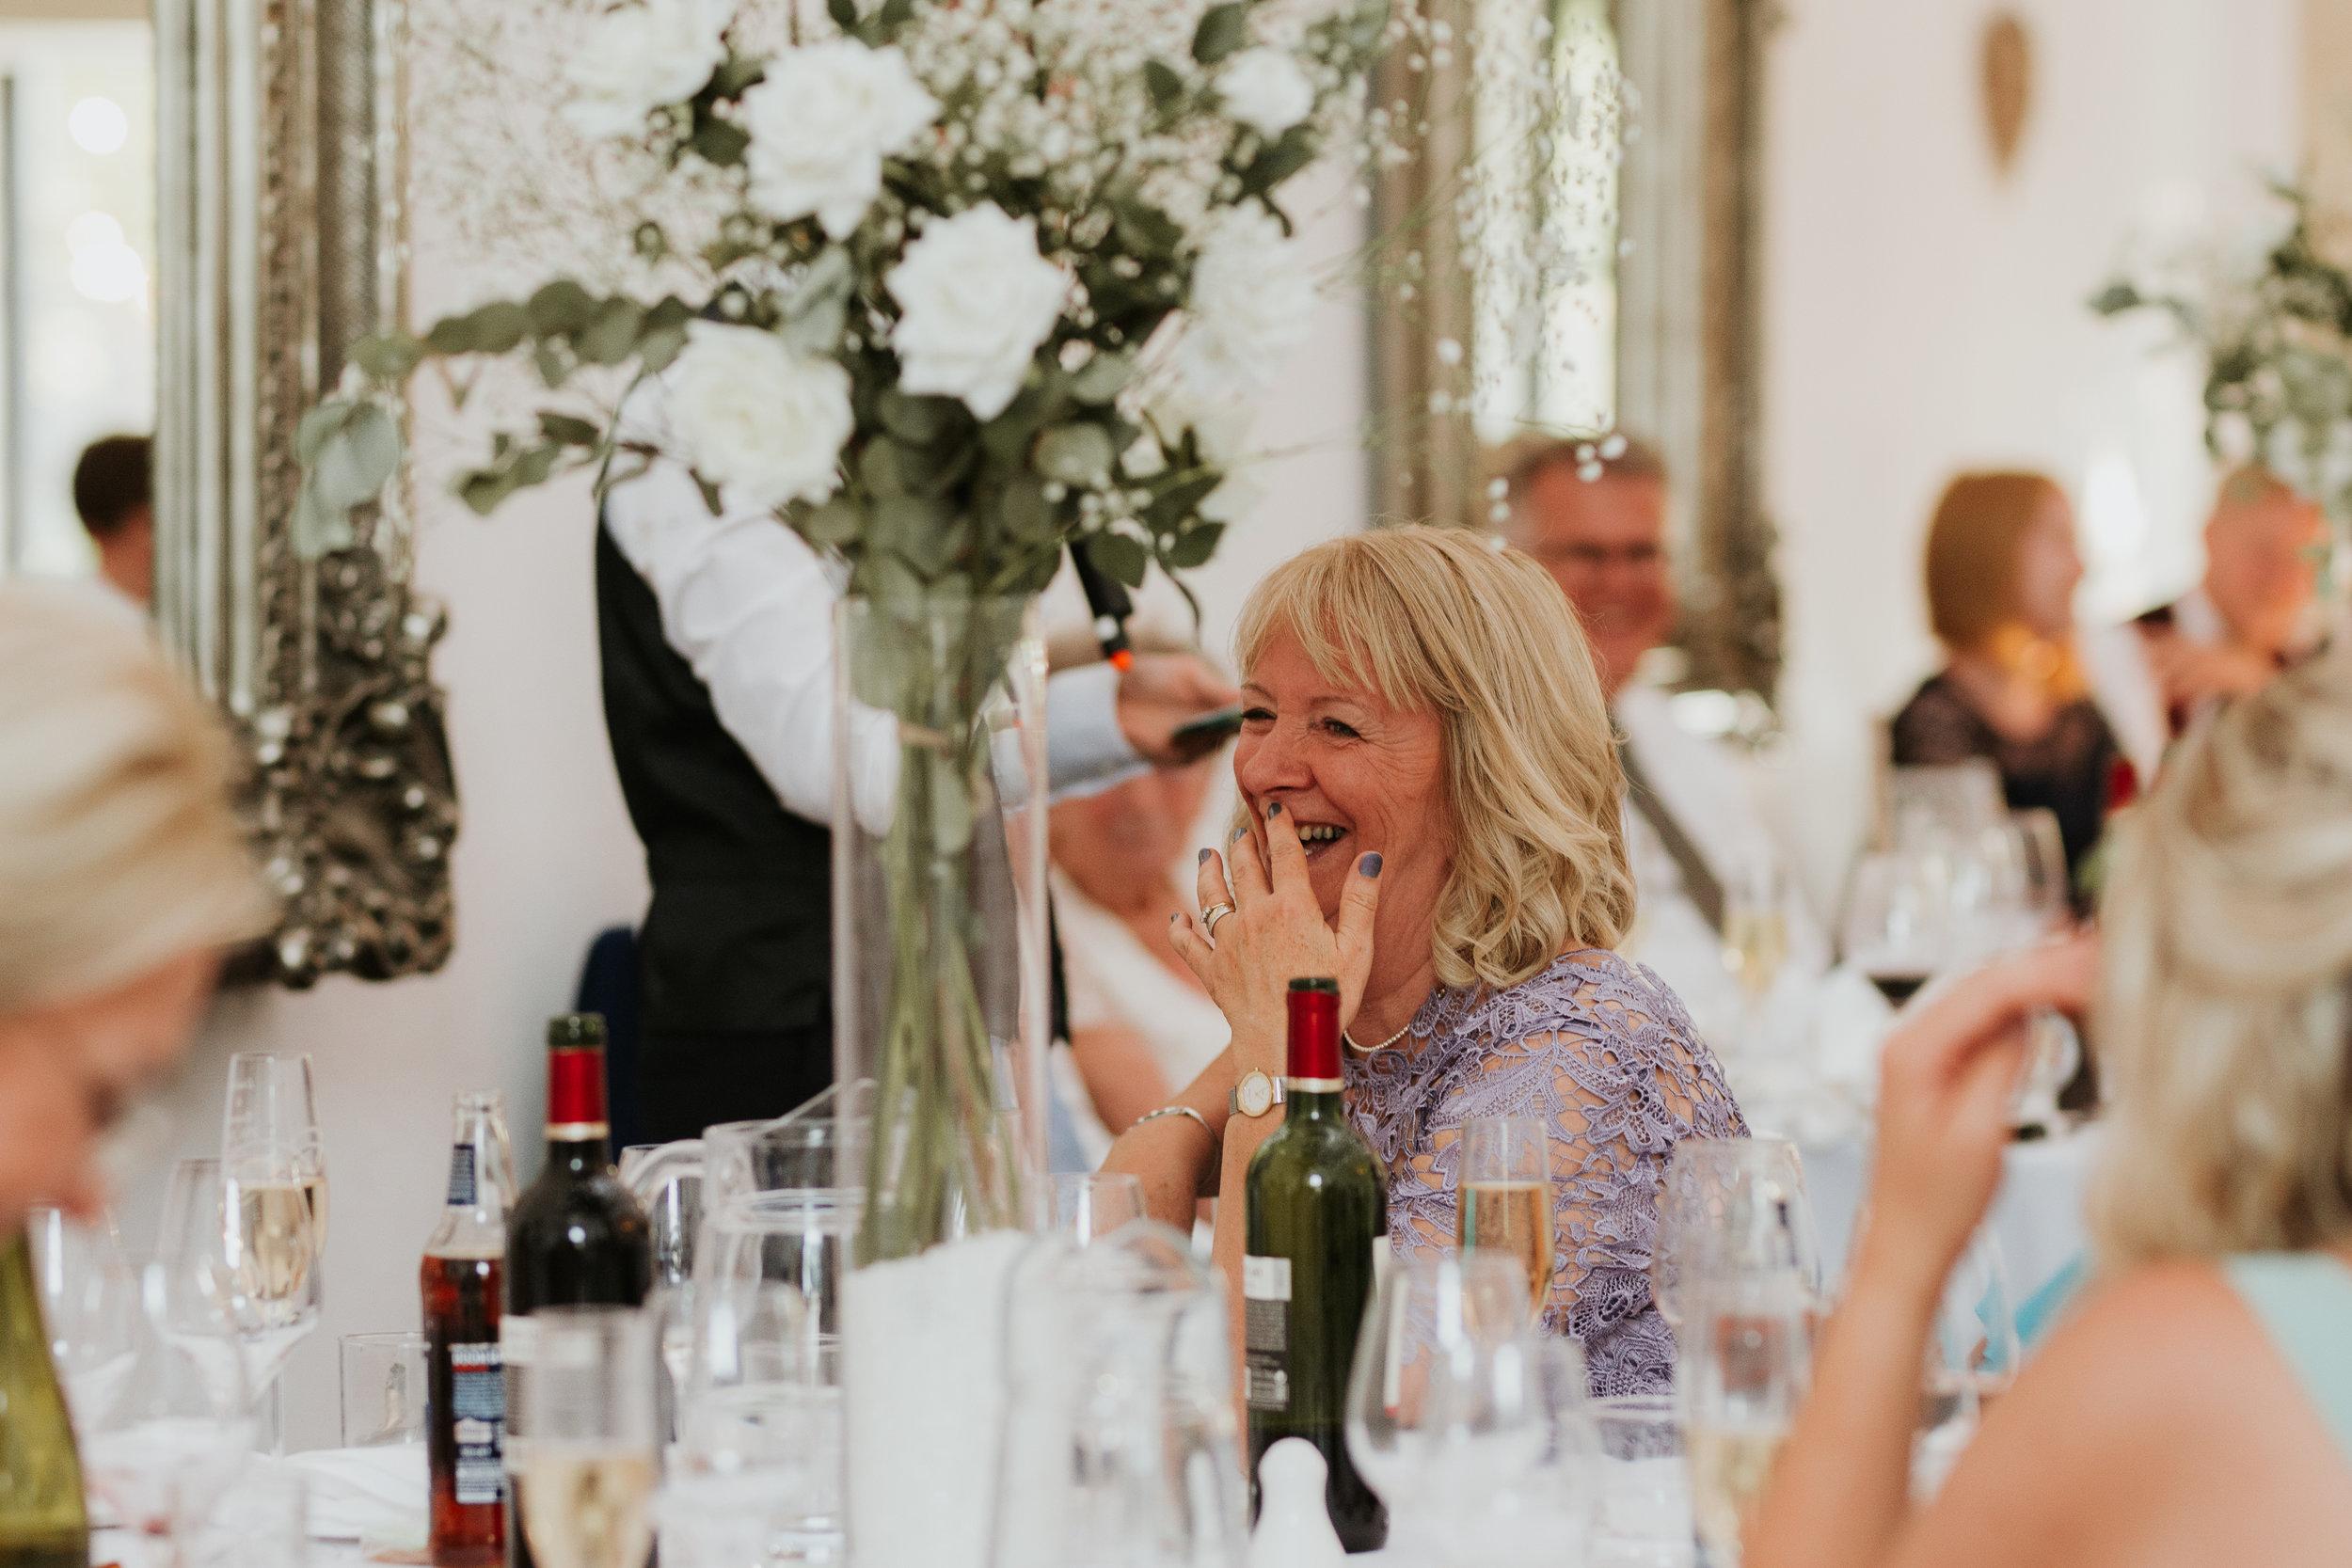 Oxfordshire-wedding-photographer-73.jpg